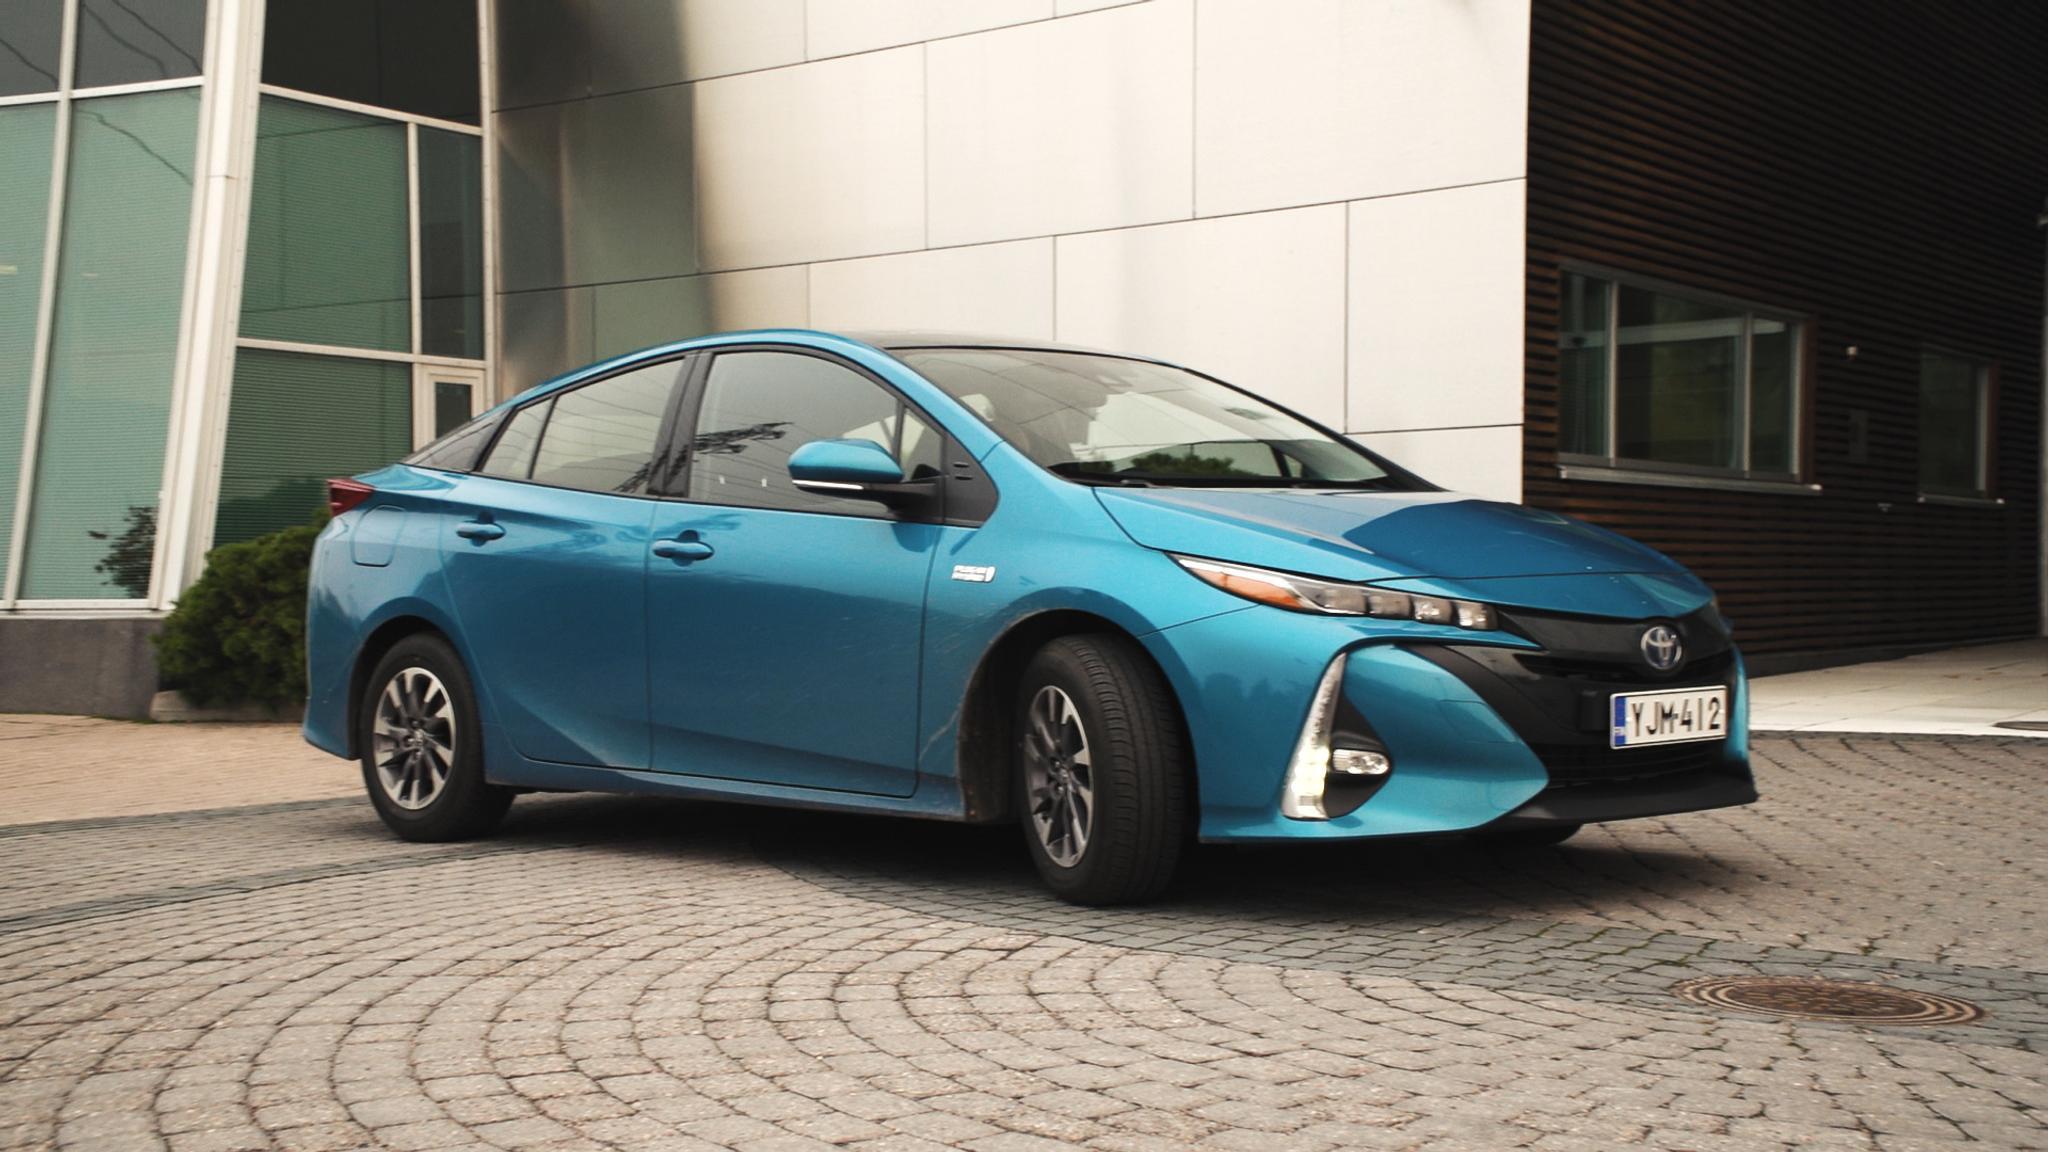 Toyota Plug In Hybrid >> Koeajo Toyota Prius Plug In Hybrid Katso Video Tuulilasi